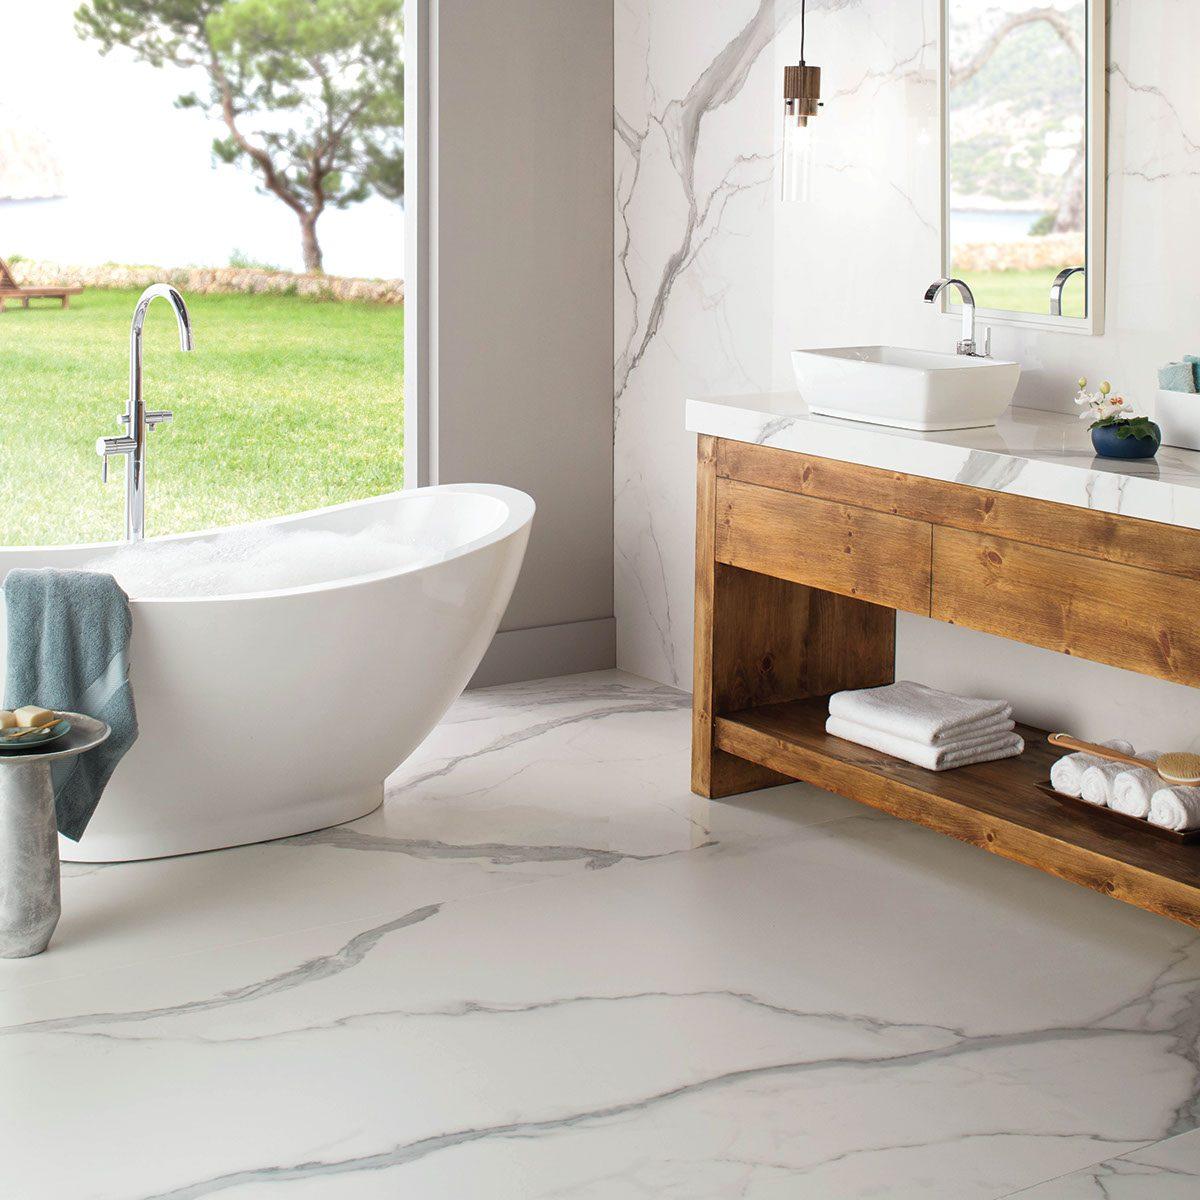 Bathroom tiles | Degraaf Interiors